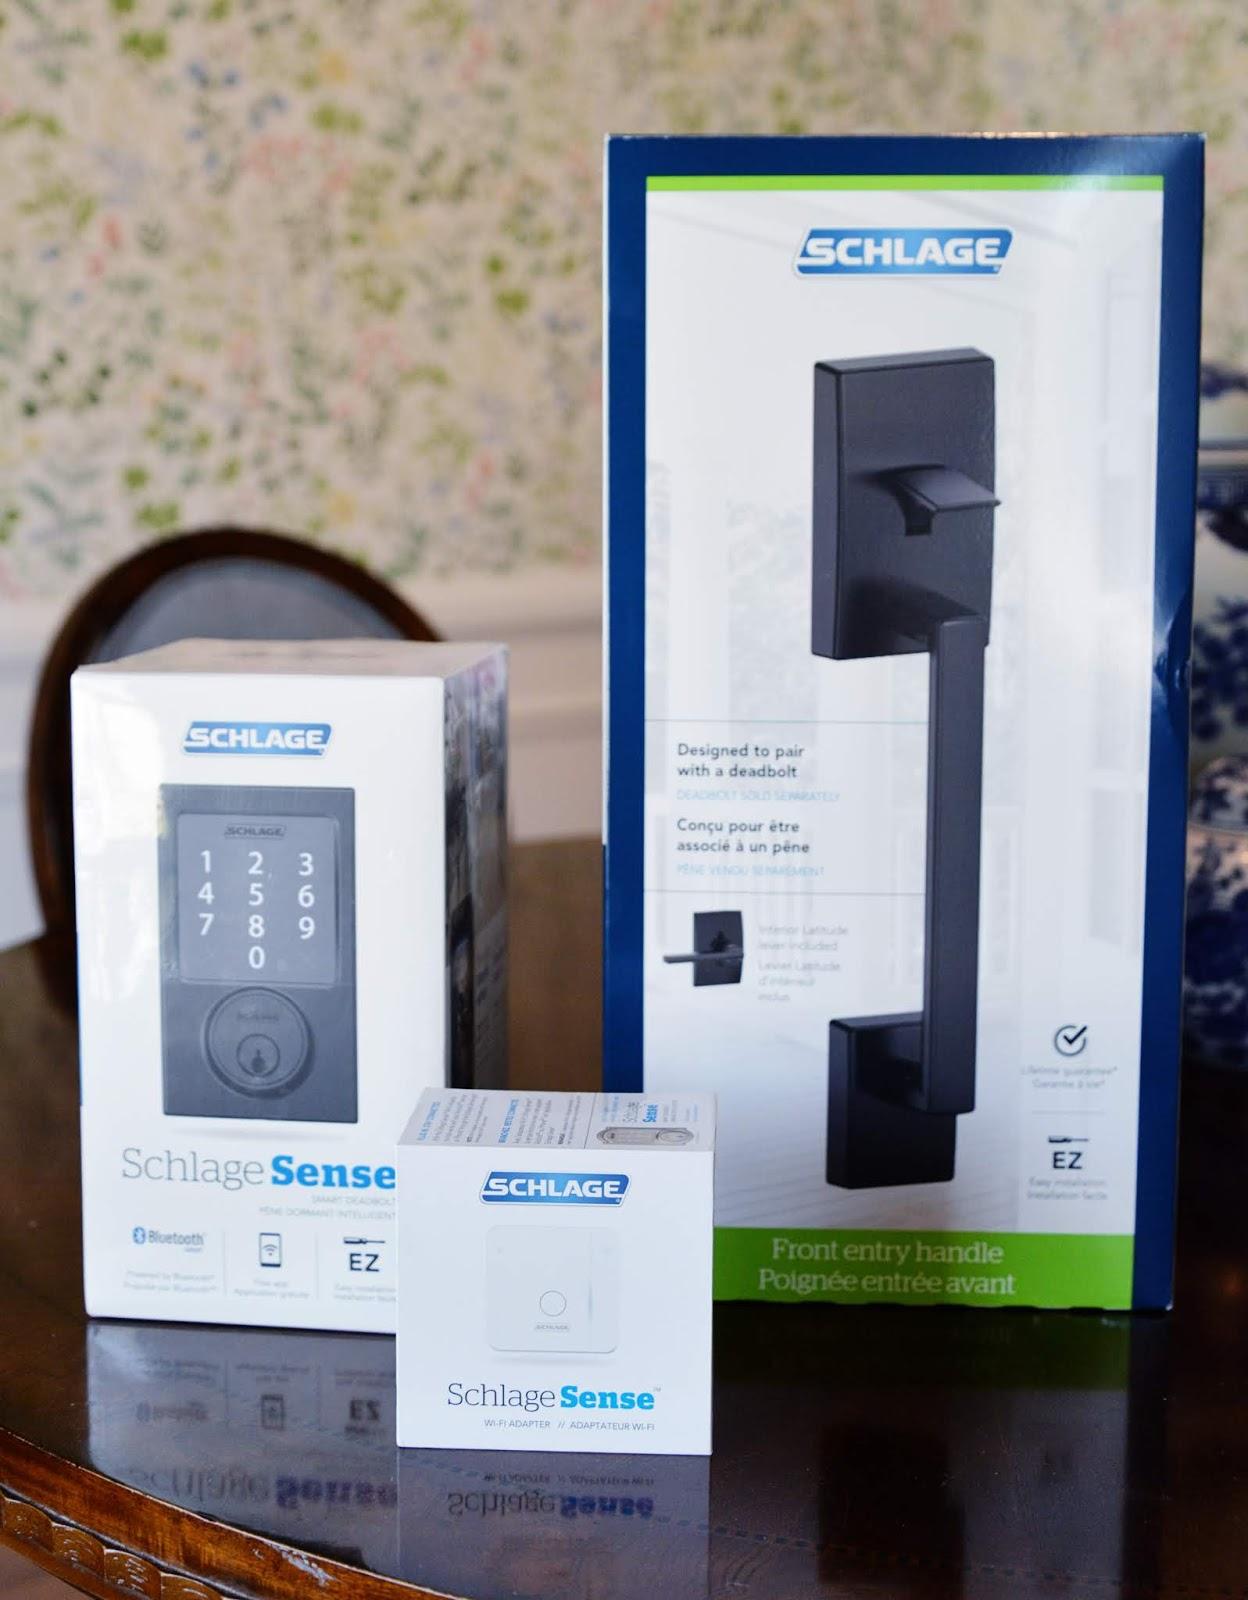 Schlage Sense smart lock, schlage sense smart deadbolt, smart lock wifi adapter